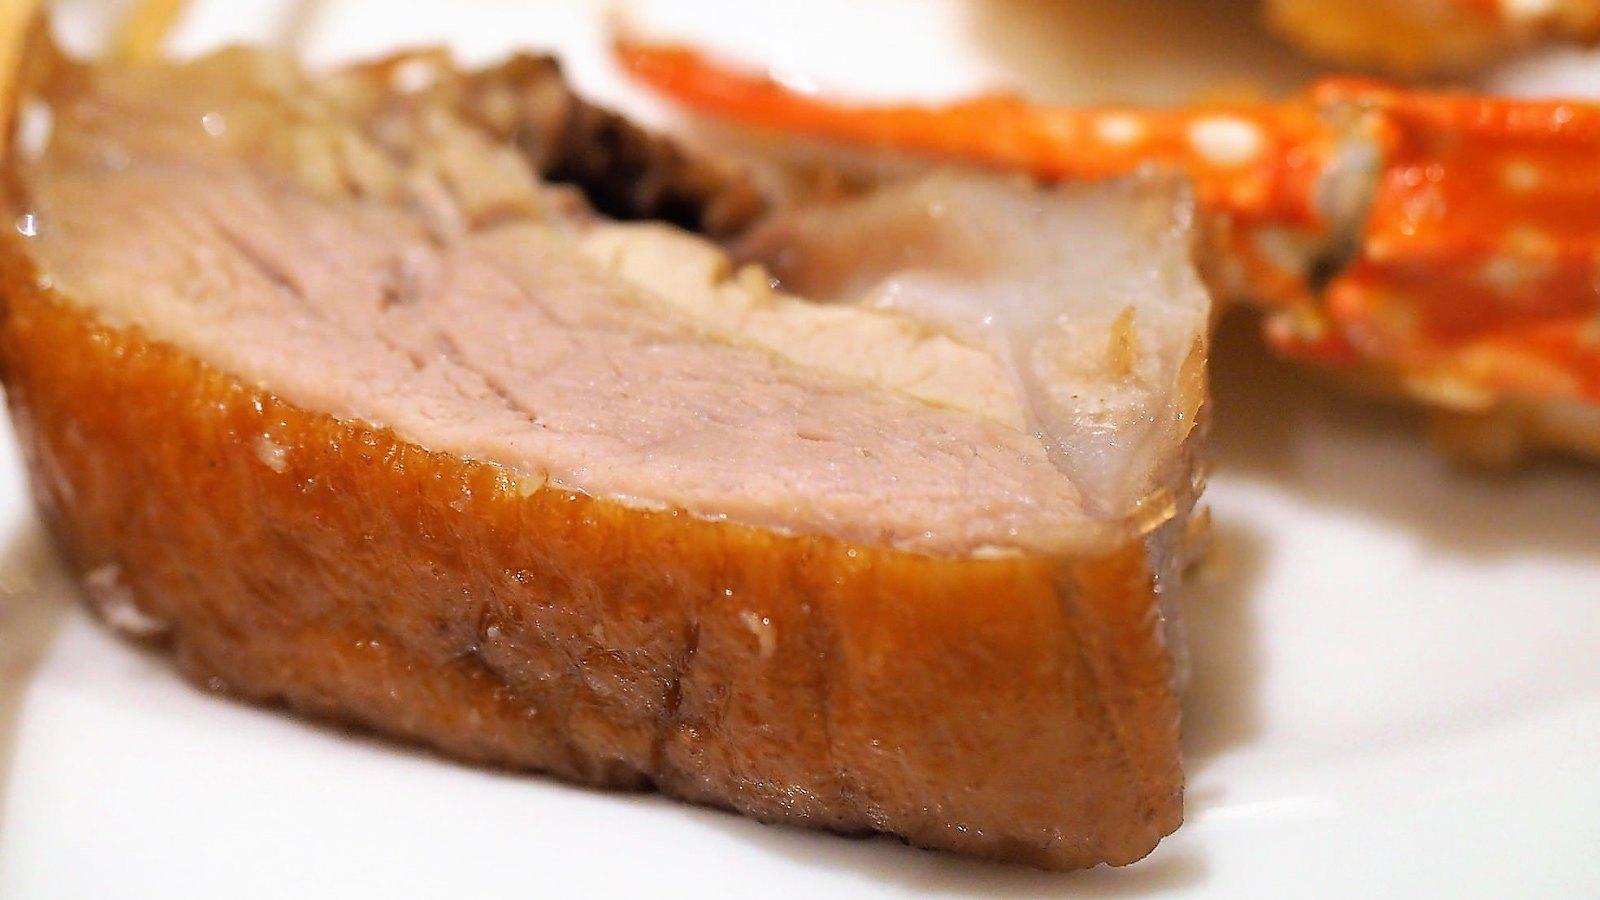 Juicy piece of roasted duck